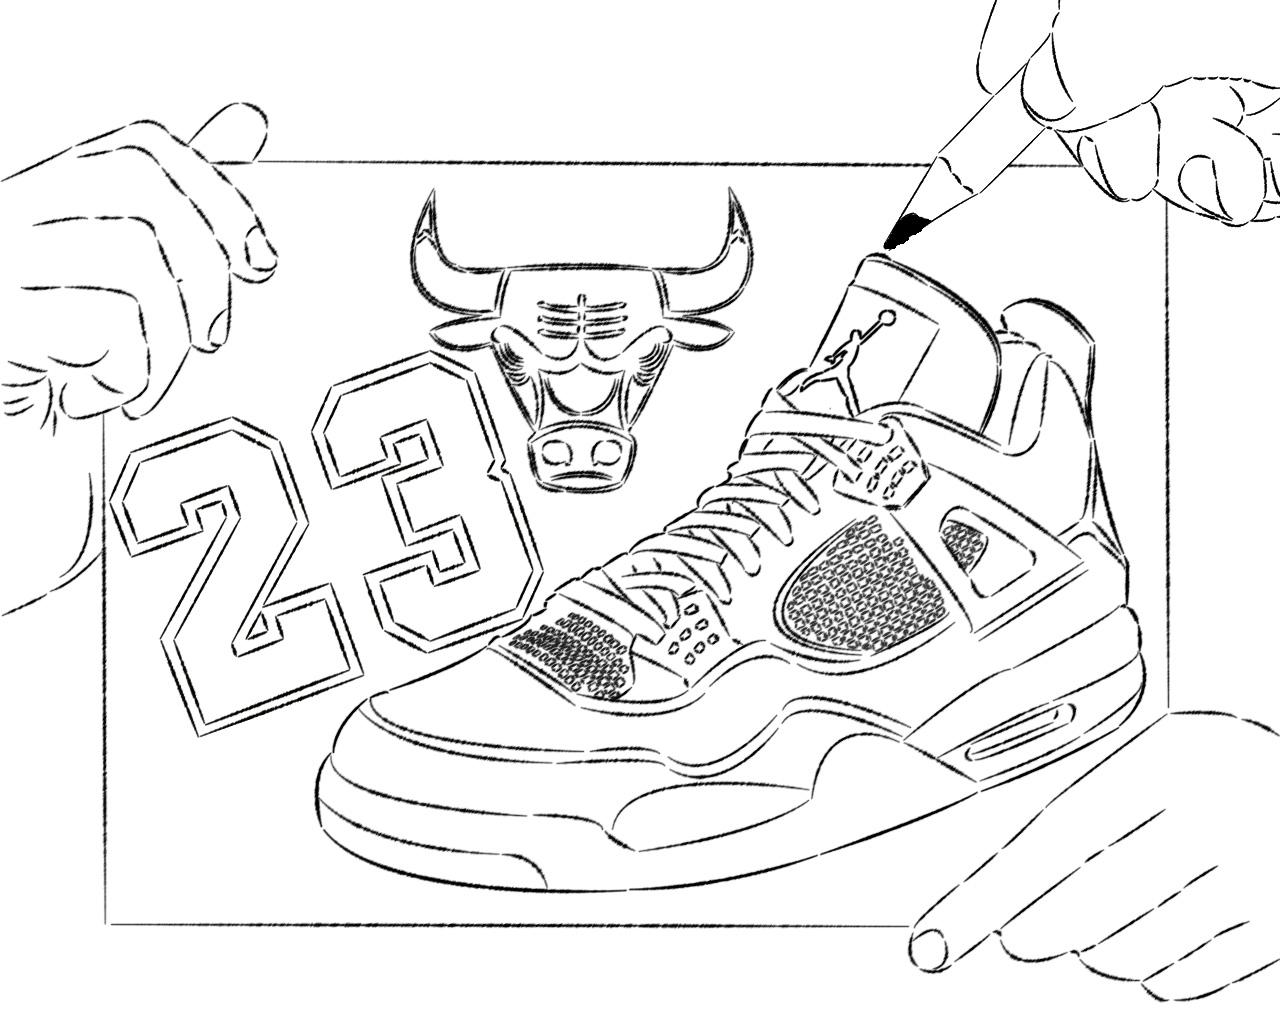 jordan 6 coloring pages - photo#13